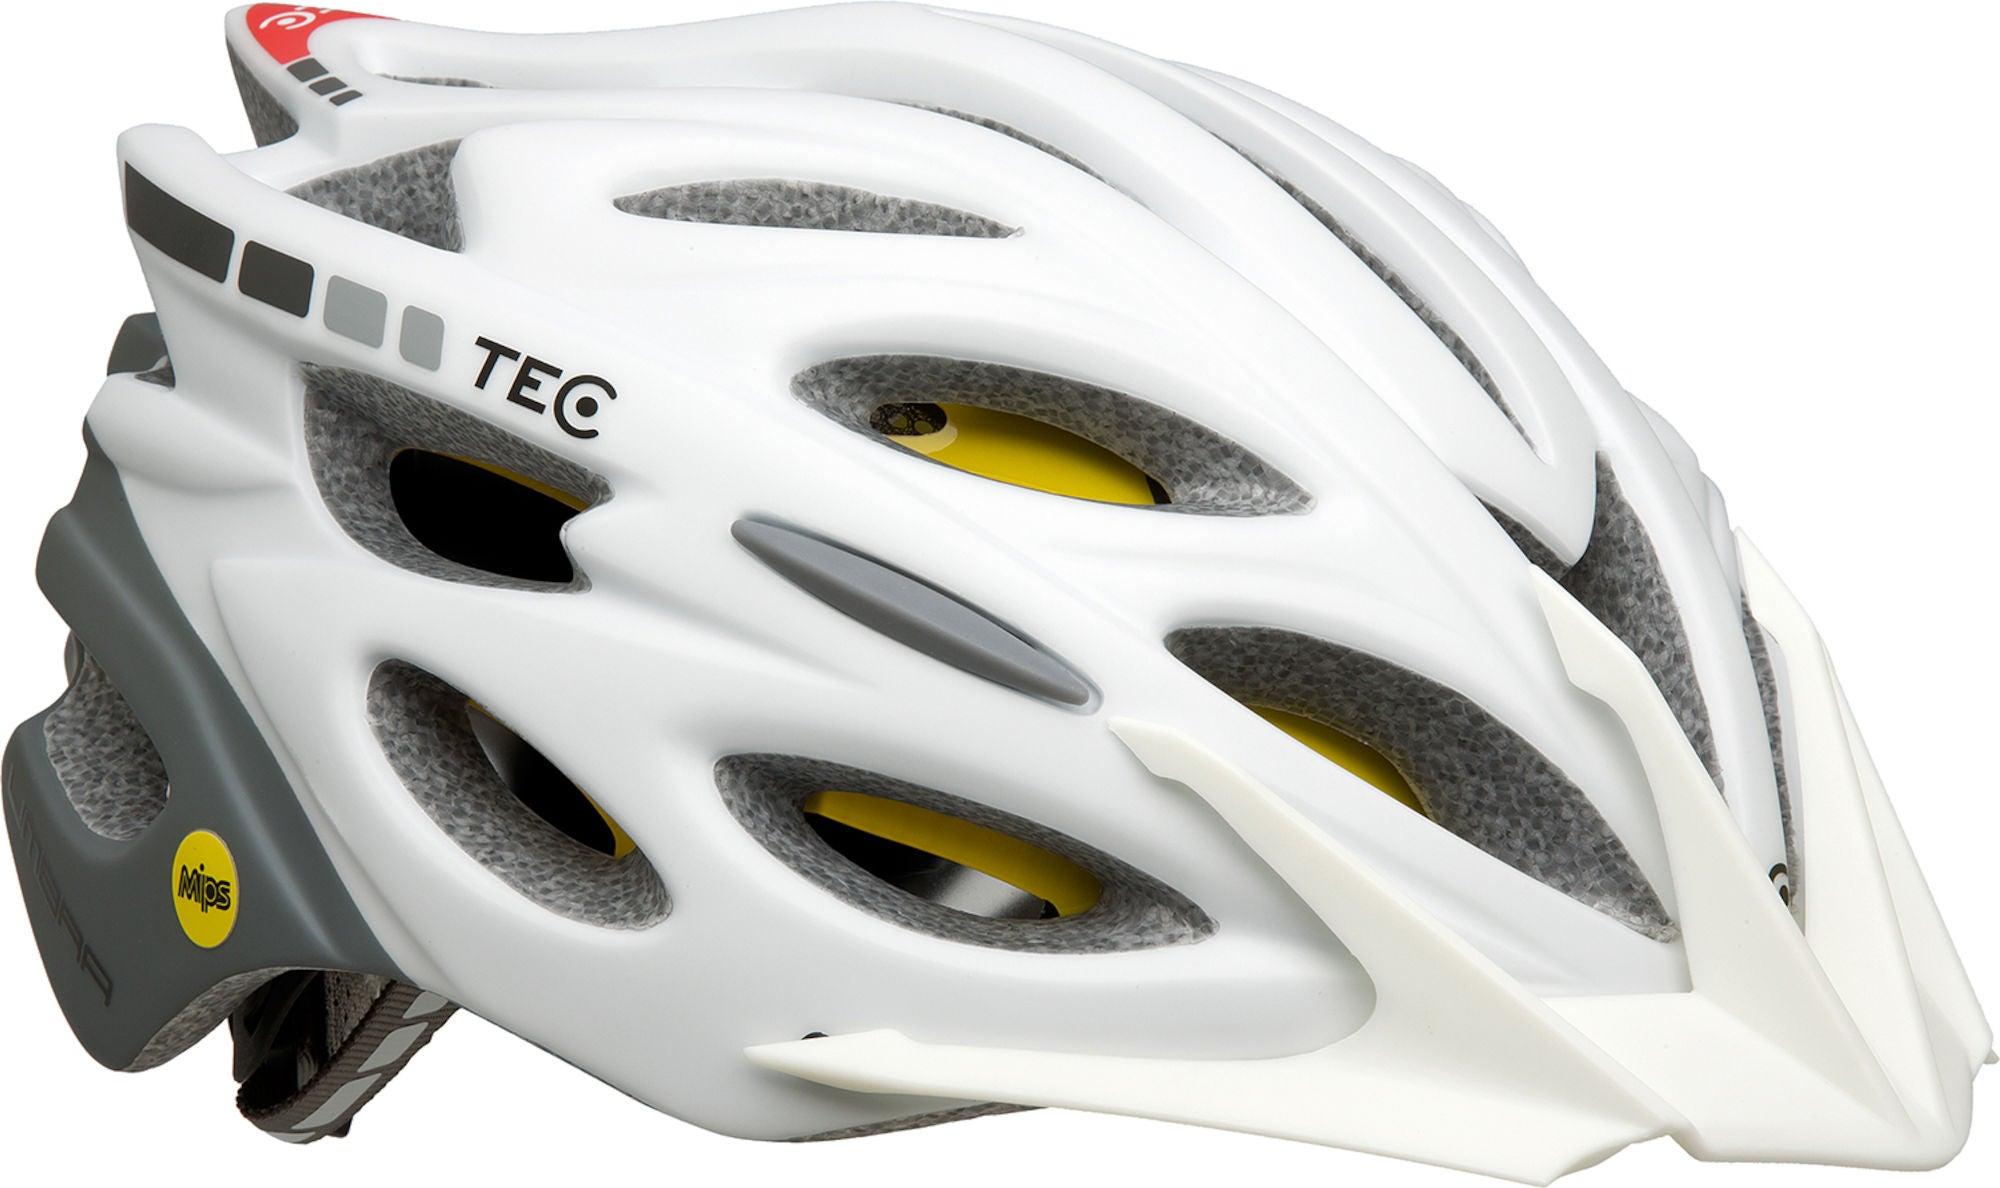 Køb Tec Cykelhjelm Umbra MIPS 50-54 cm, Hvid | Hjelme